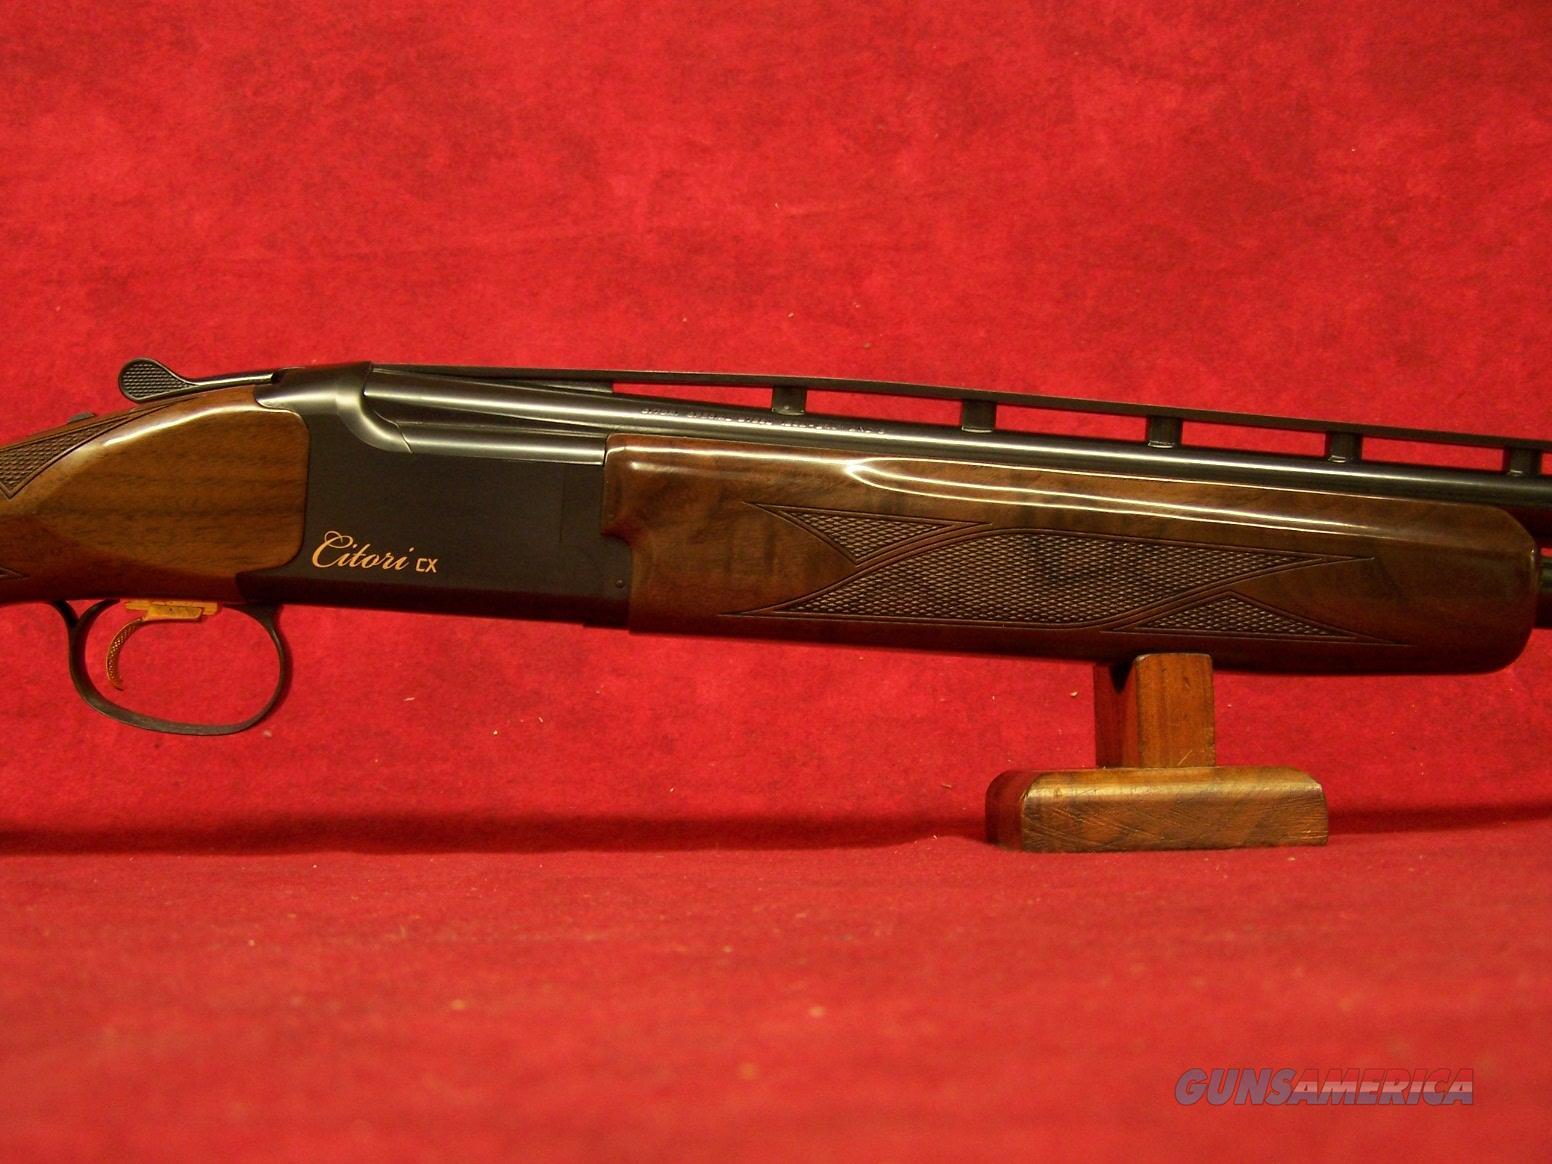 "Browning Citori CX 12ga 3"" Chamber 28"" Barrel (018115304)  Guns > Shotguns > Browning Shotguns > Over Unders > Citori > Trap/Skeet"